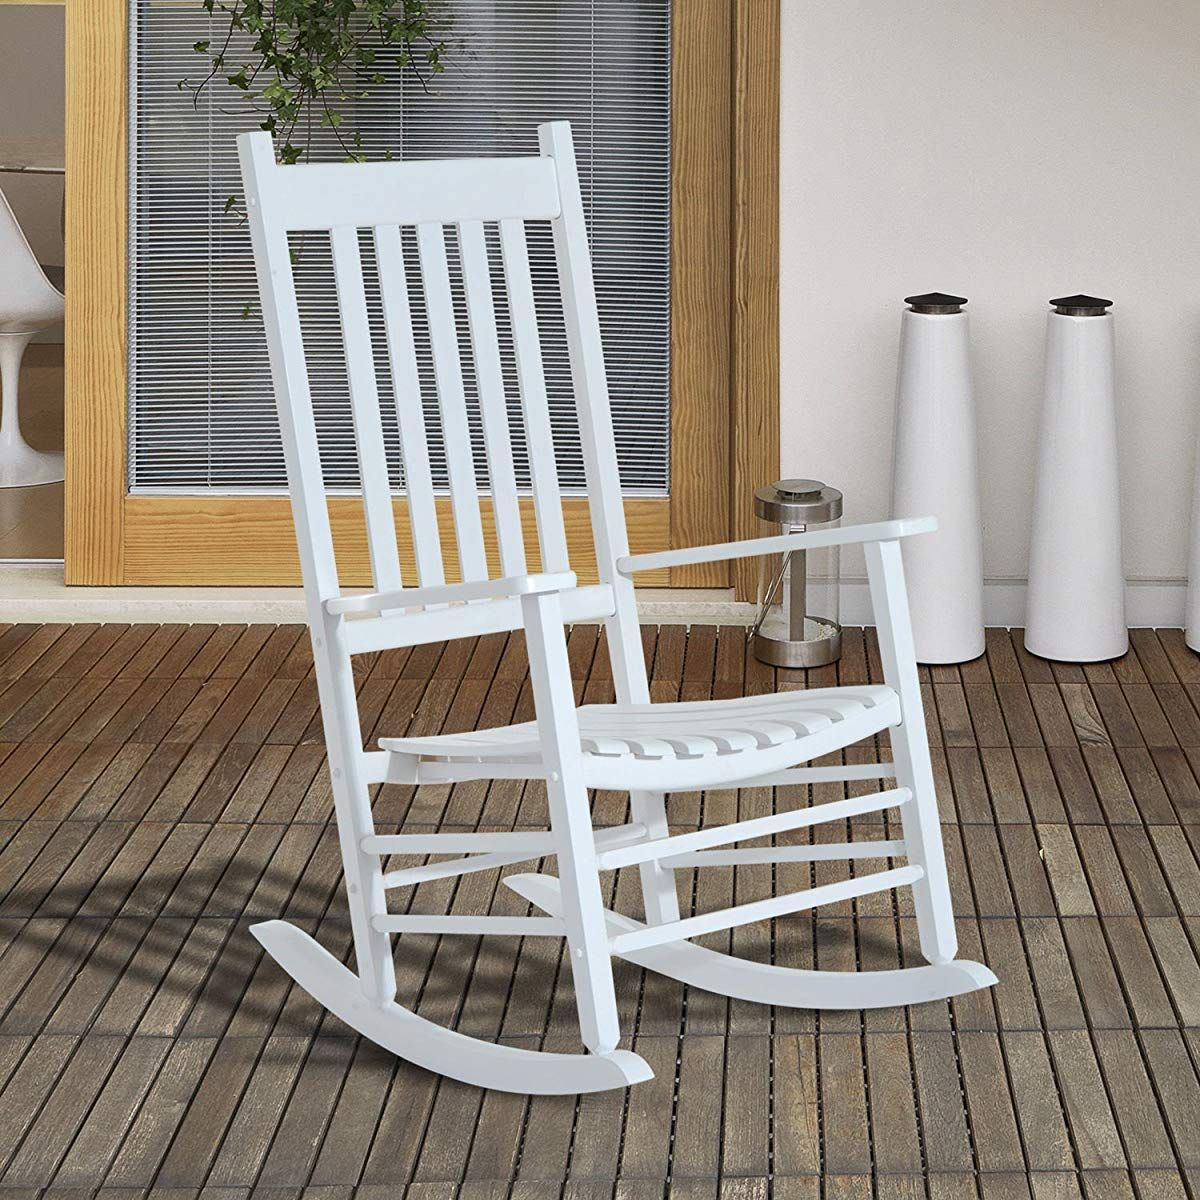 Strange Porch Rocking Chair White Outdoor Rocking Chair Creativecarmelina Interior Chair Design Creativecarmelinacom